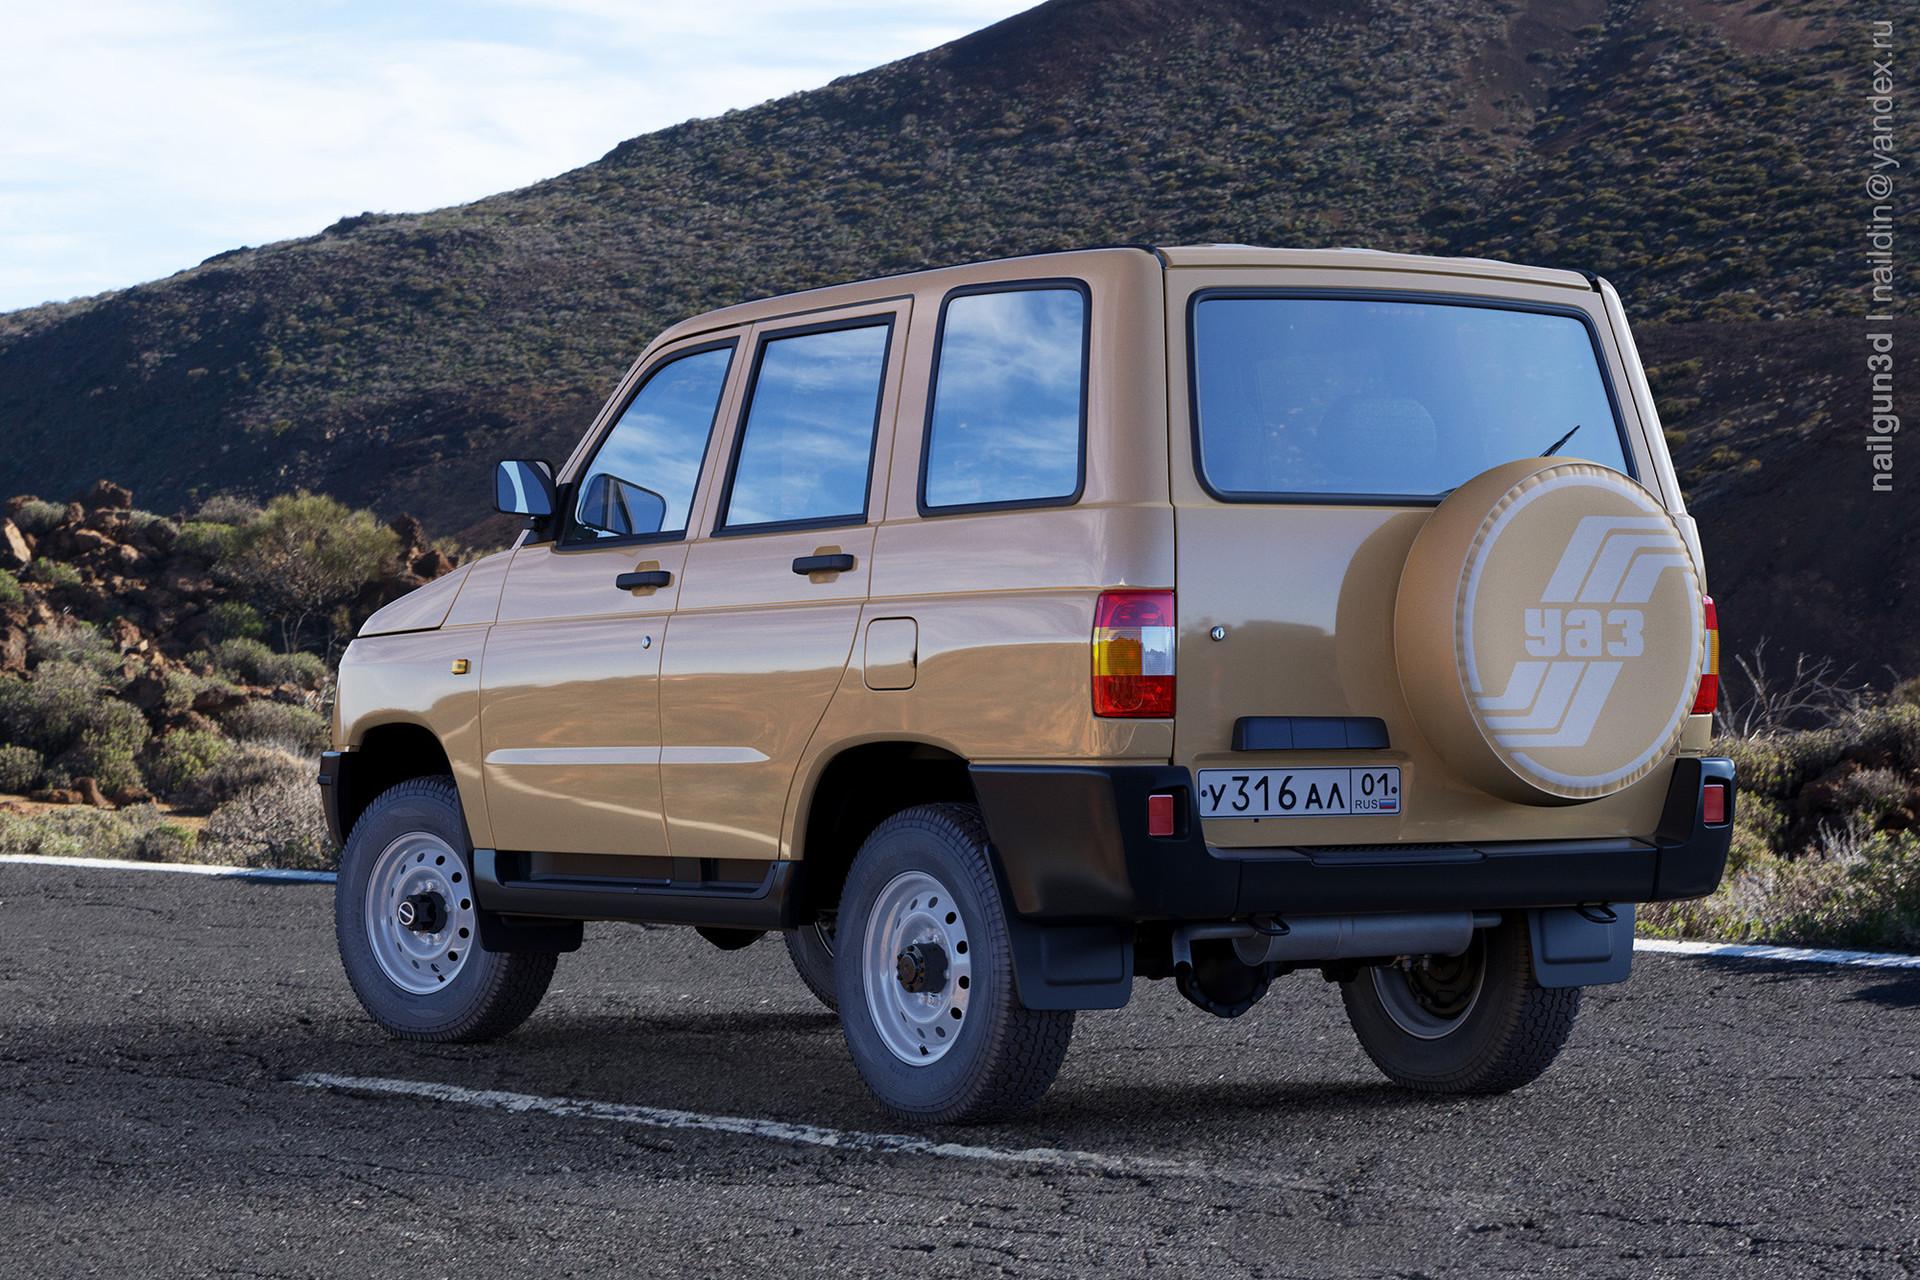 Nail khusnutdinov als 228 010 uaz 3160 simbir rear view 3x